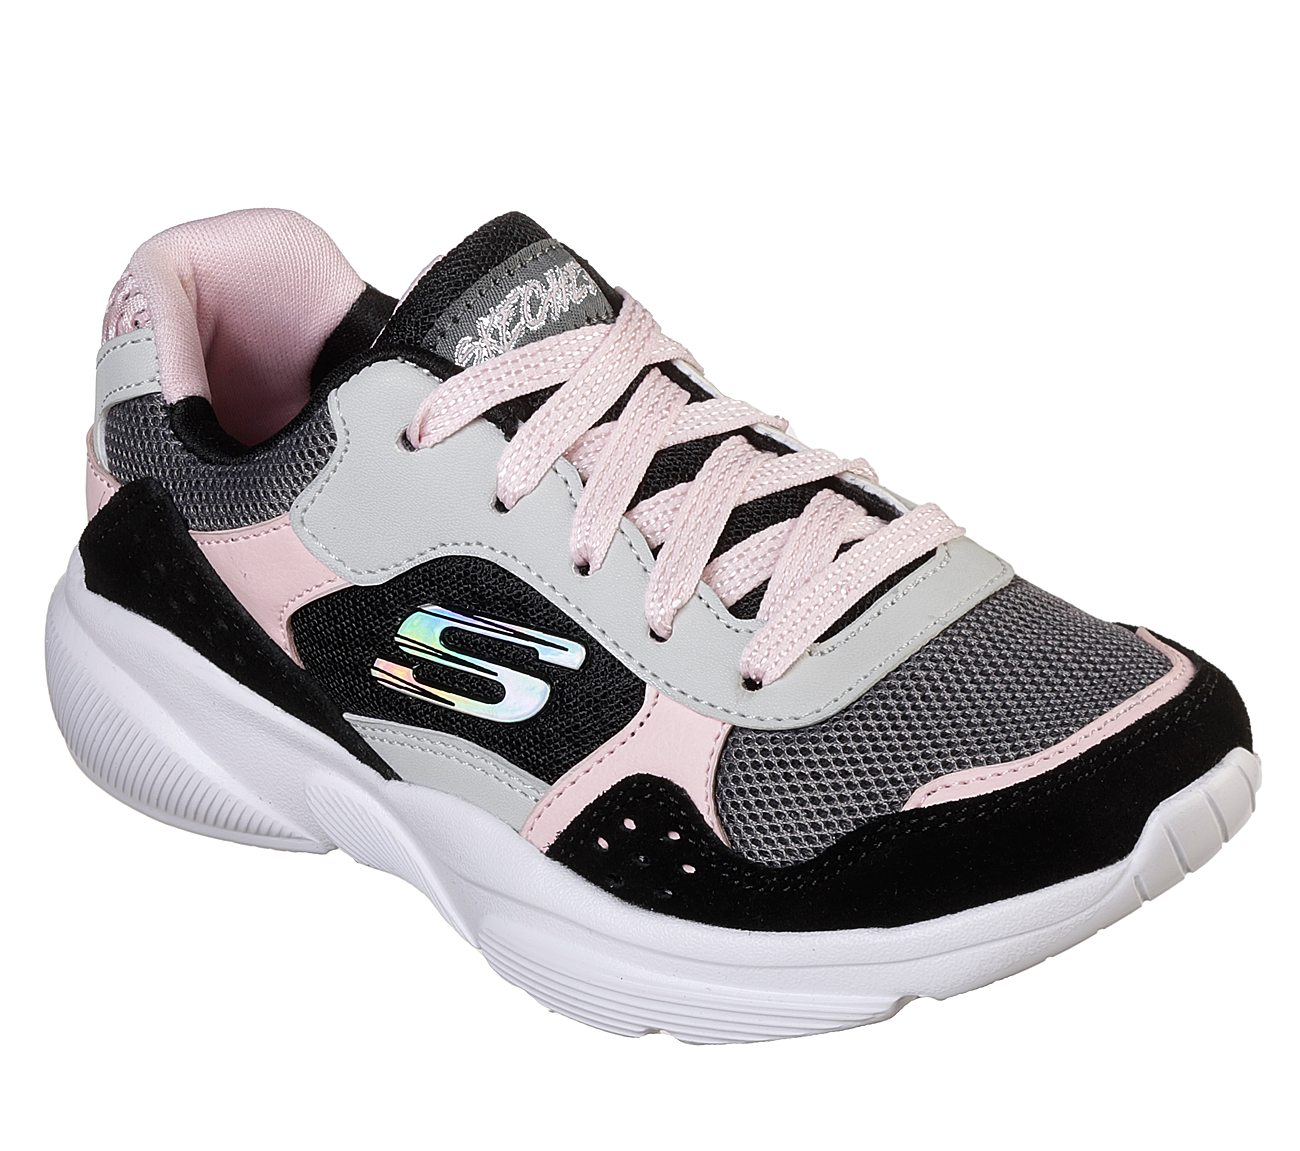 Buy SKECHERS Meridian Charted Sport Shoes Y4zCk